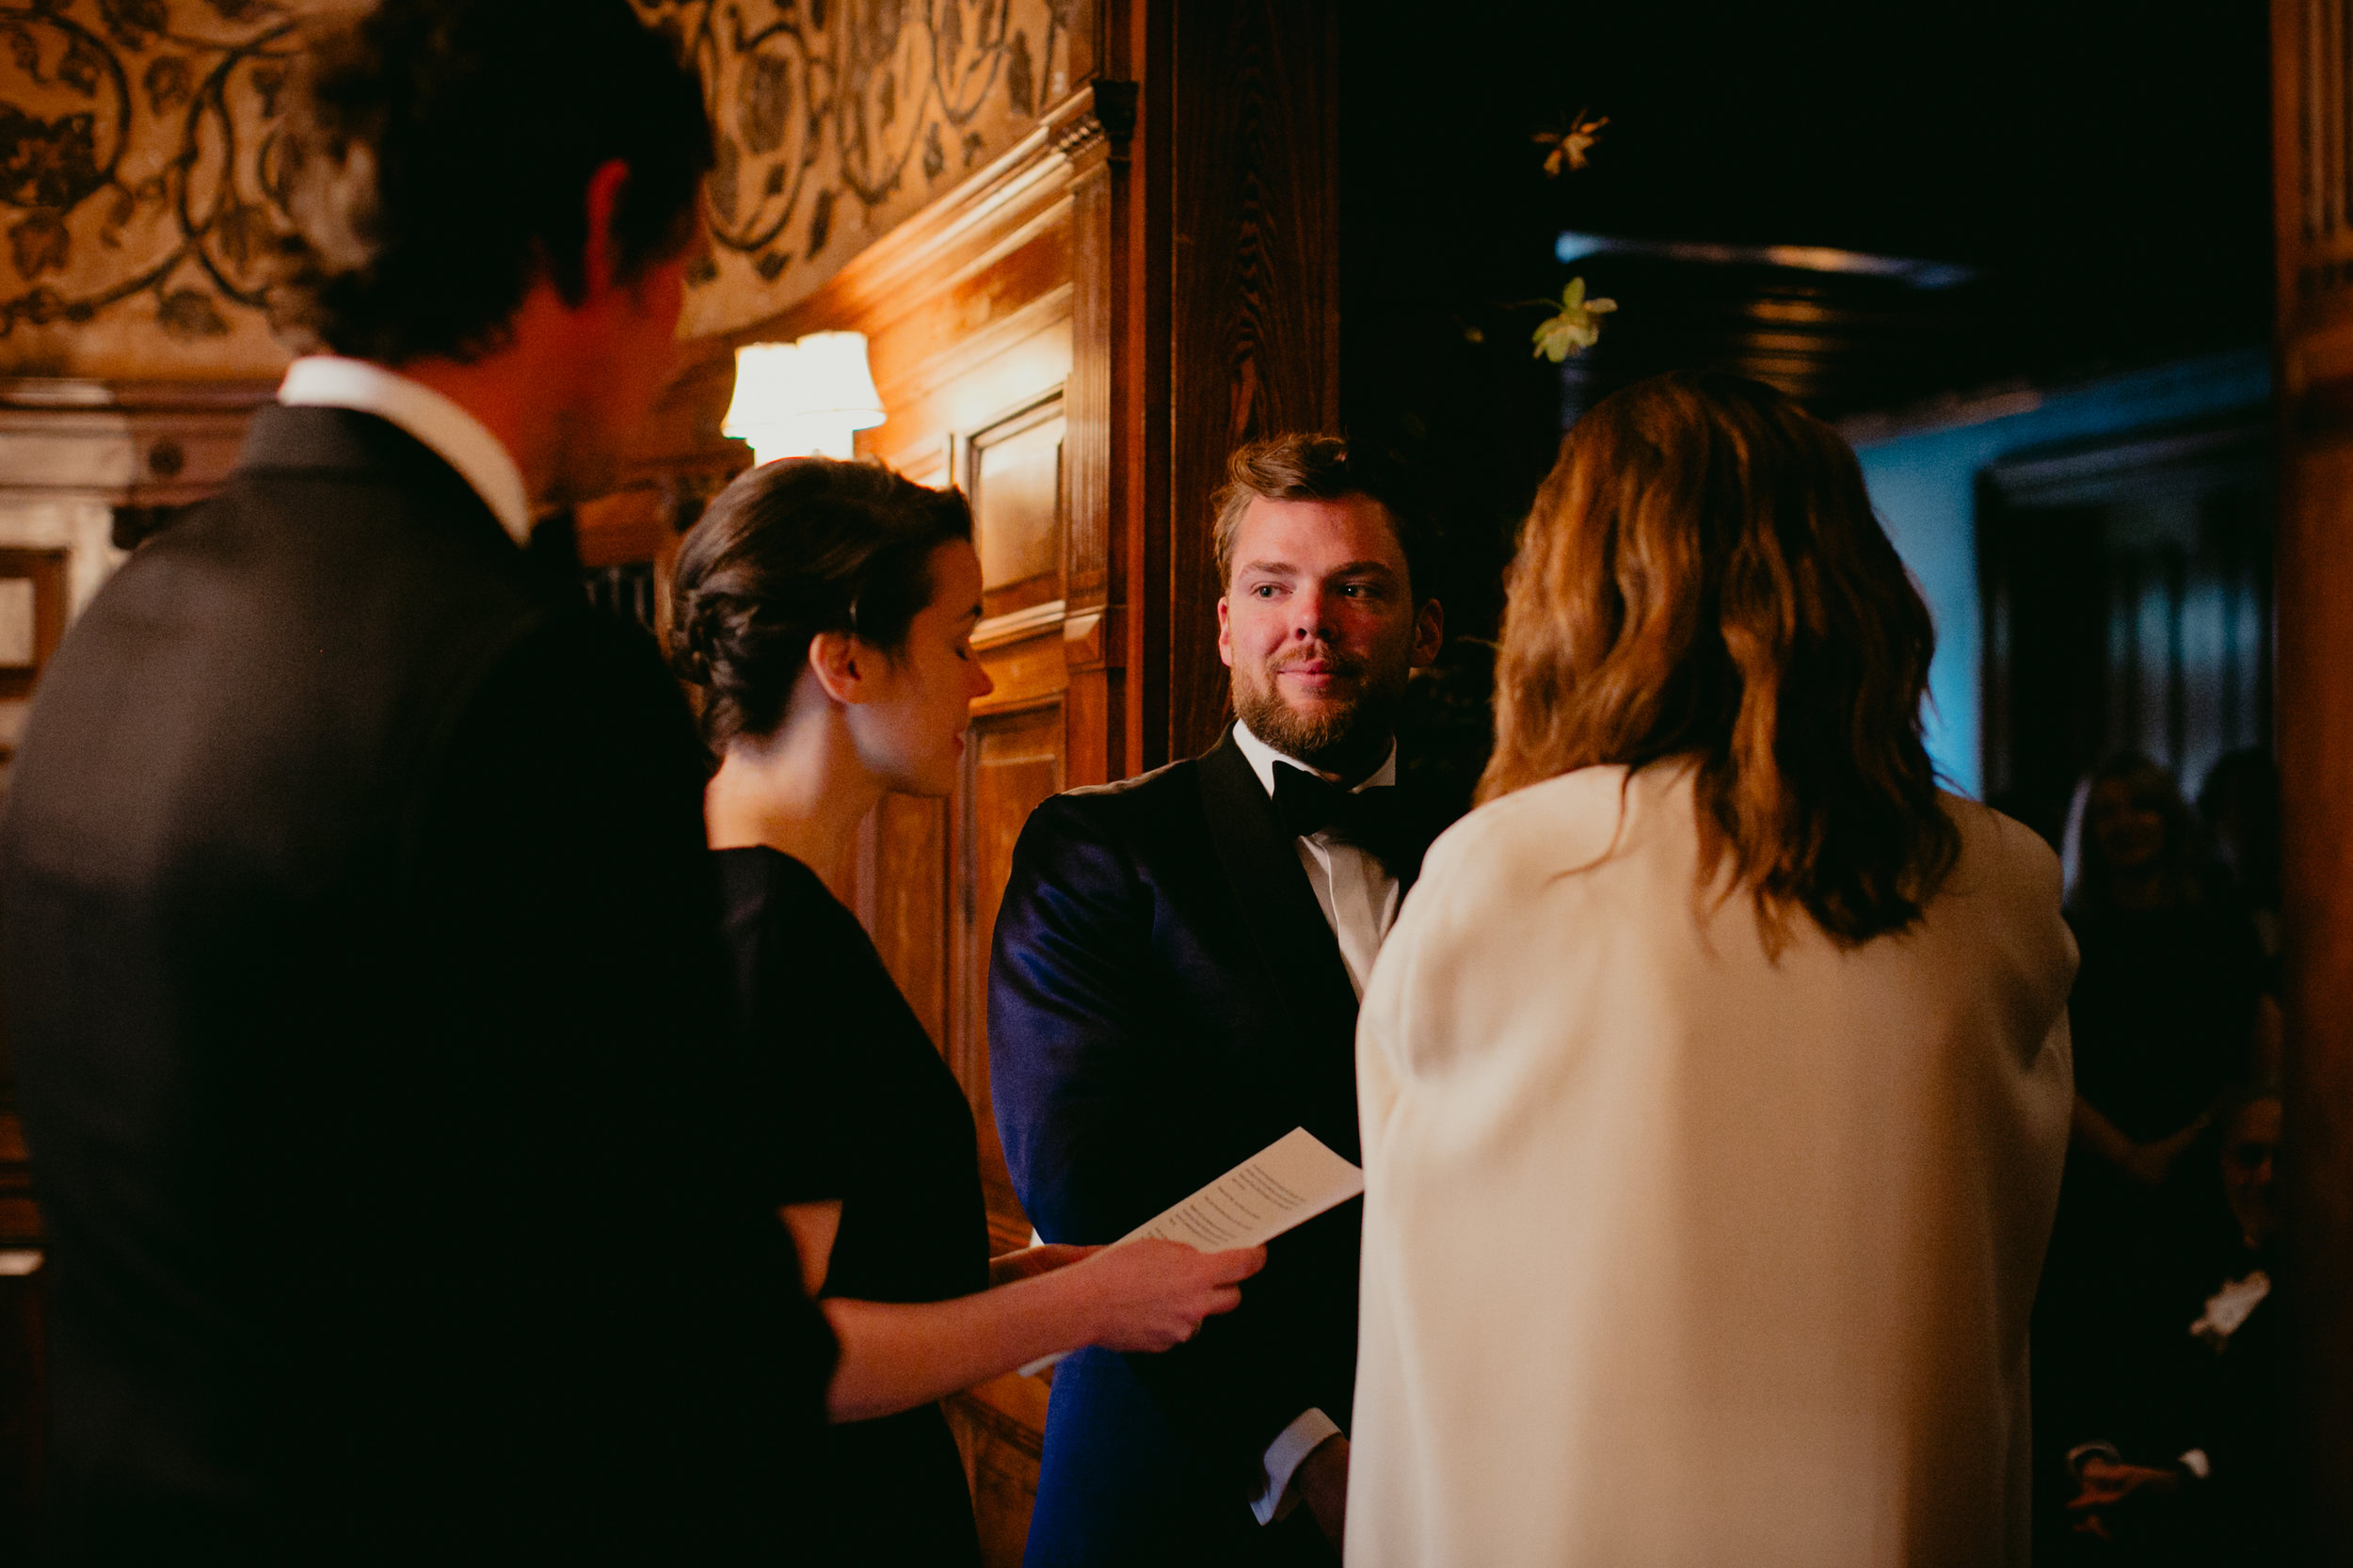 Tiger_House_The_Inn_at_Hudson-Wedding_Chellise_Michael_Photography-218.jpg